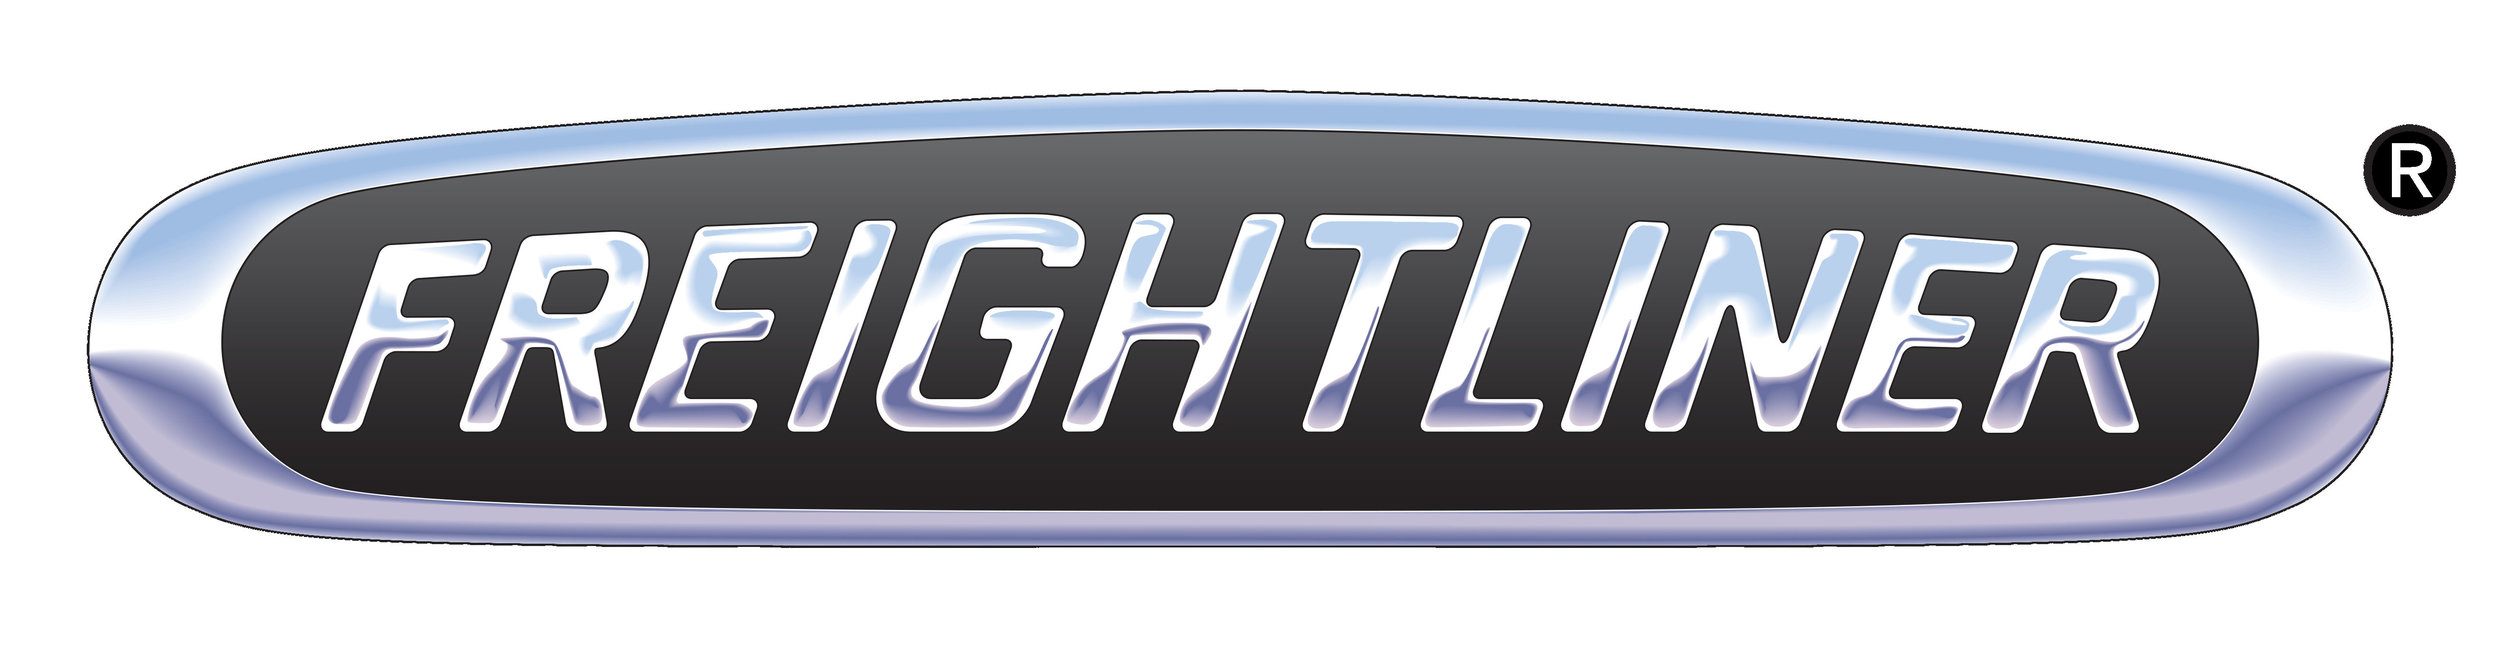 Freightliner_GOLD.jpg